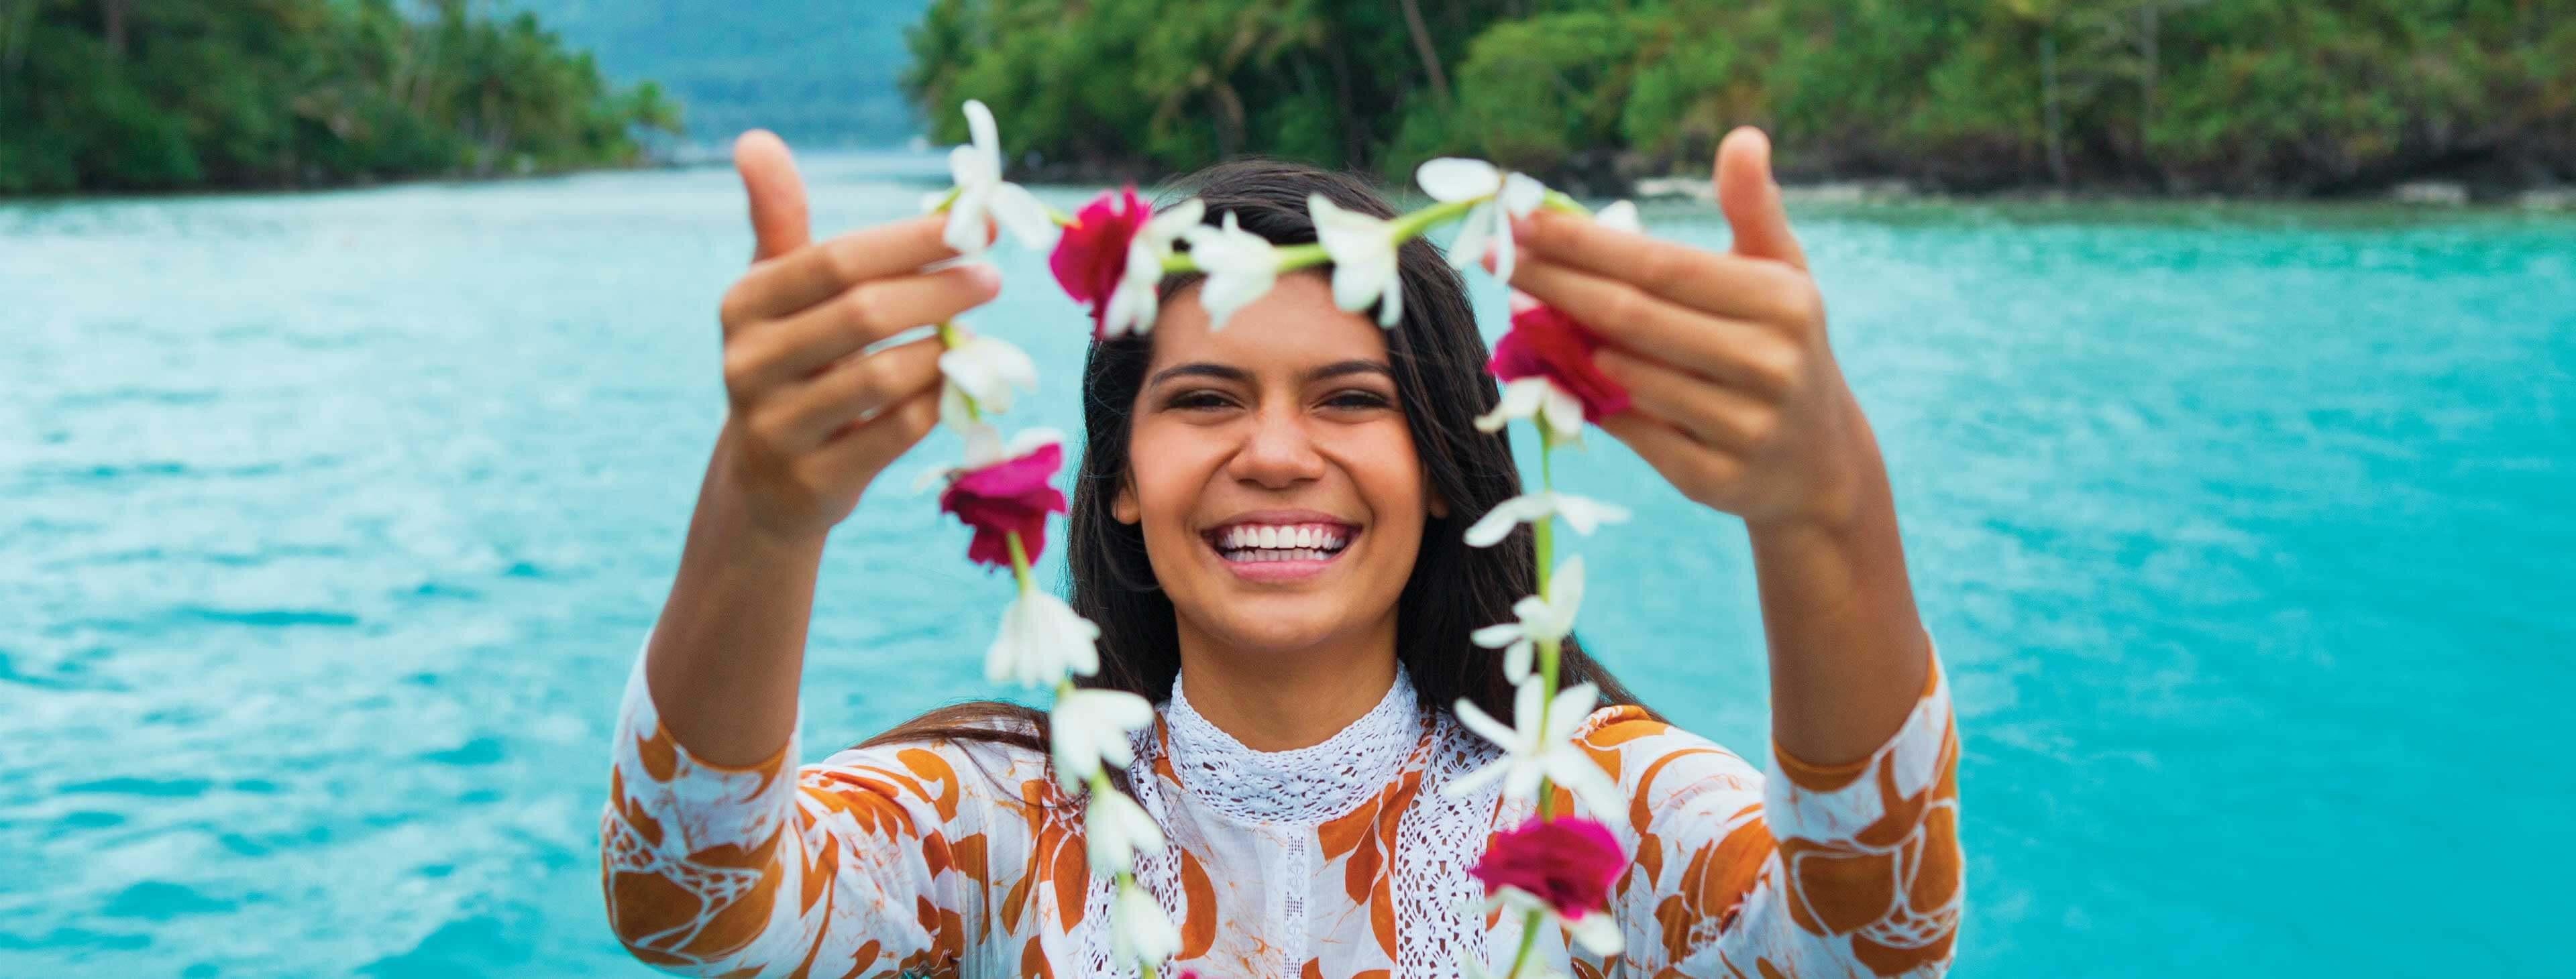 San Francisco to Tahiti French Polynesia $627 RT Nonstop Airfares on United Airlines (Travel Nov-May 2020)